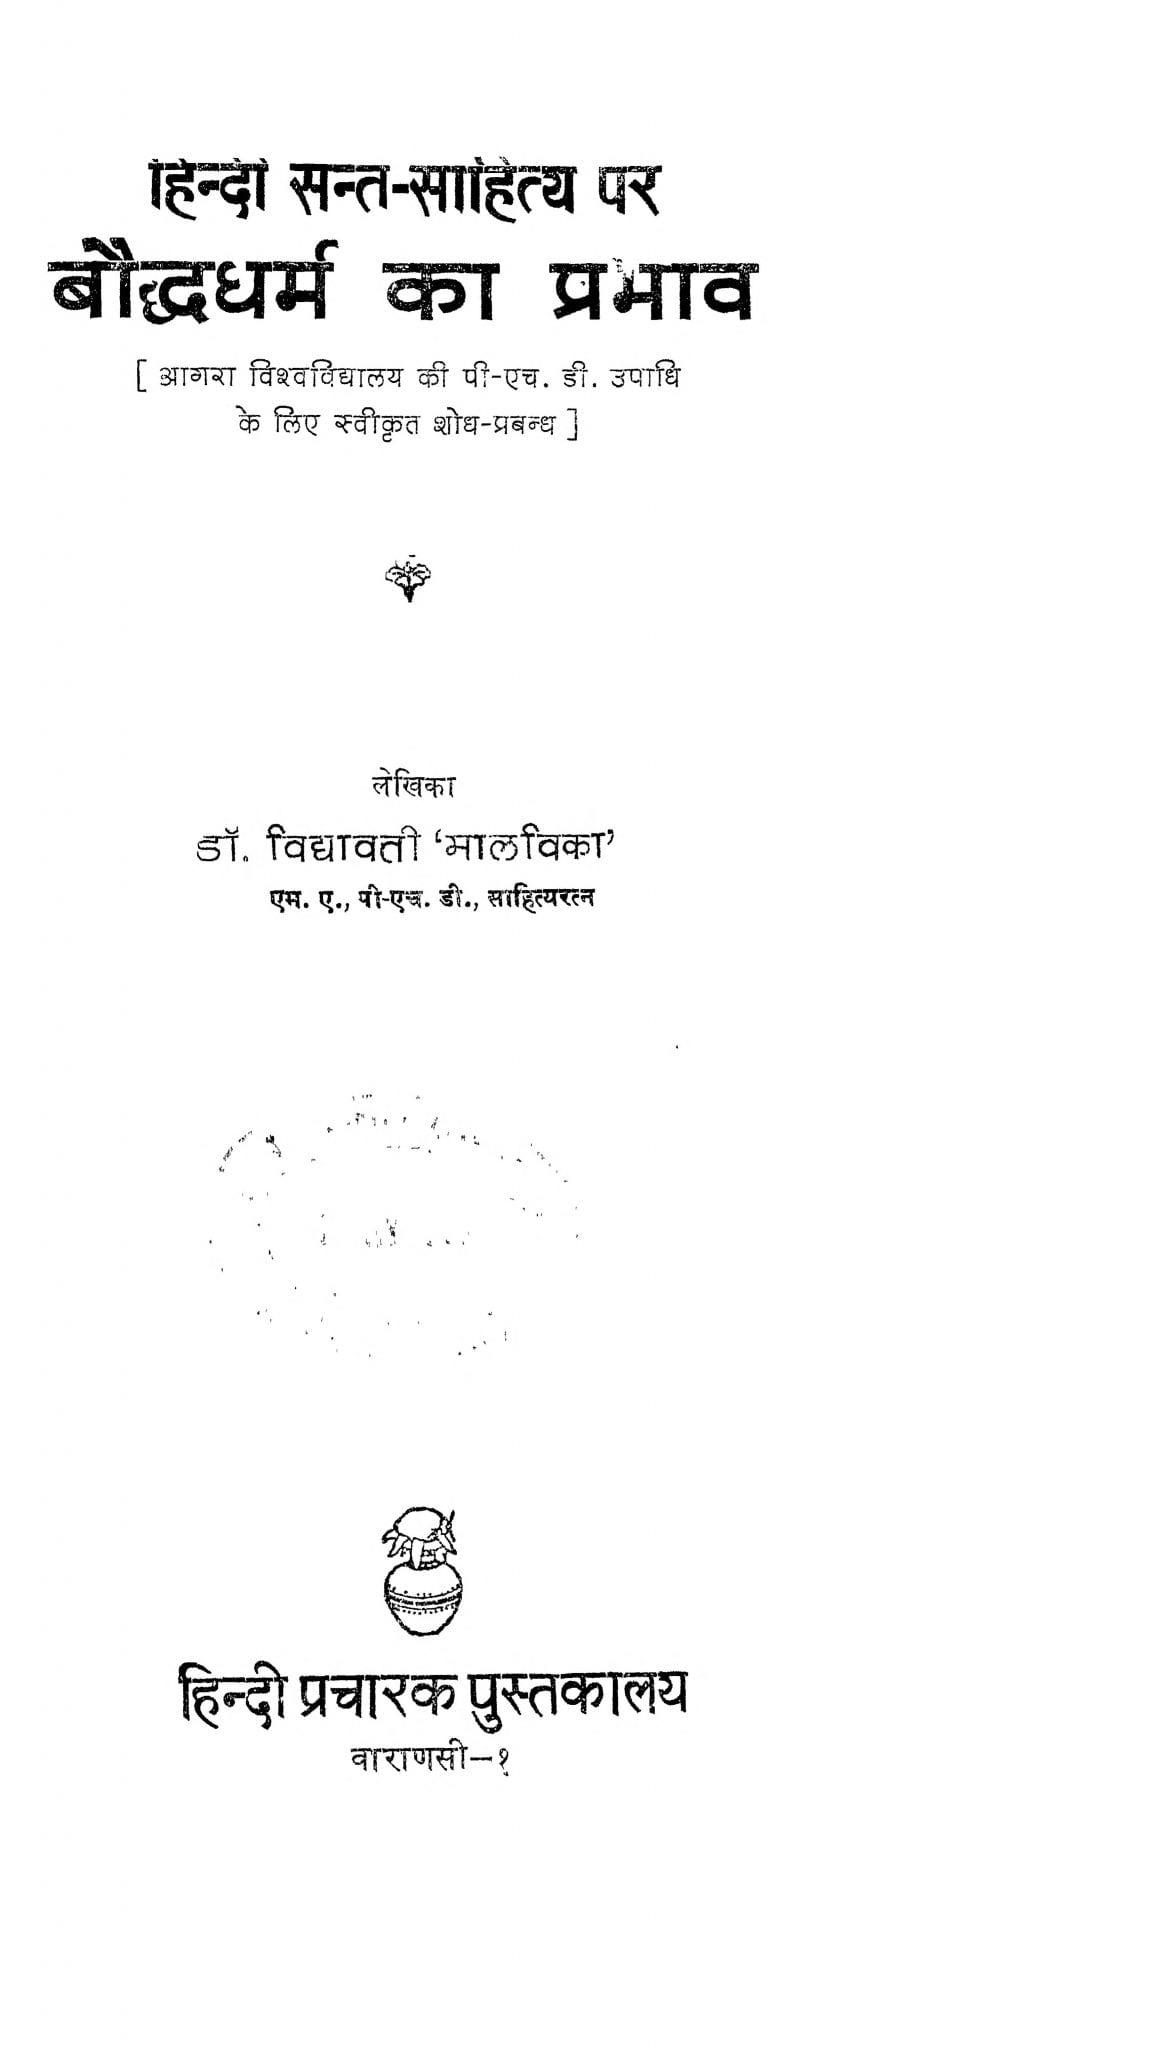 Book Image : हिंदी सन्त - साहित्य पर बौद्धधर्म का प्रभाव  - Hindi Sant Sahitya Par Bauddhdarma Ka Prabhav